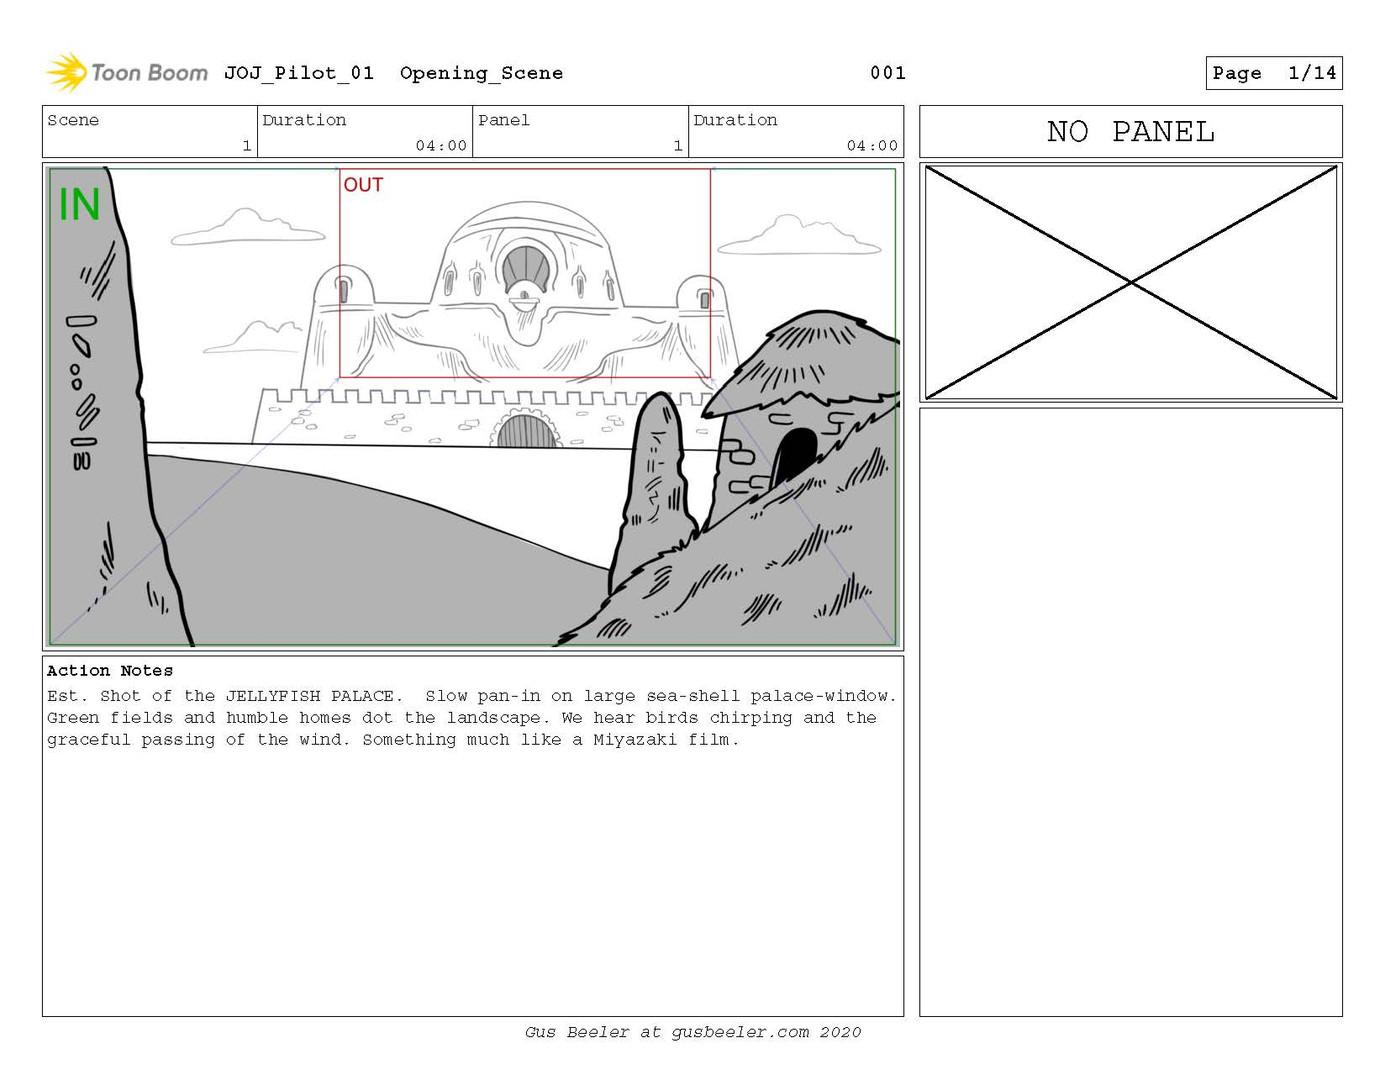 Abeeler_JOJ_Pilot_002_Page_02.jpg